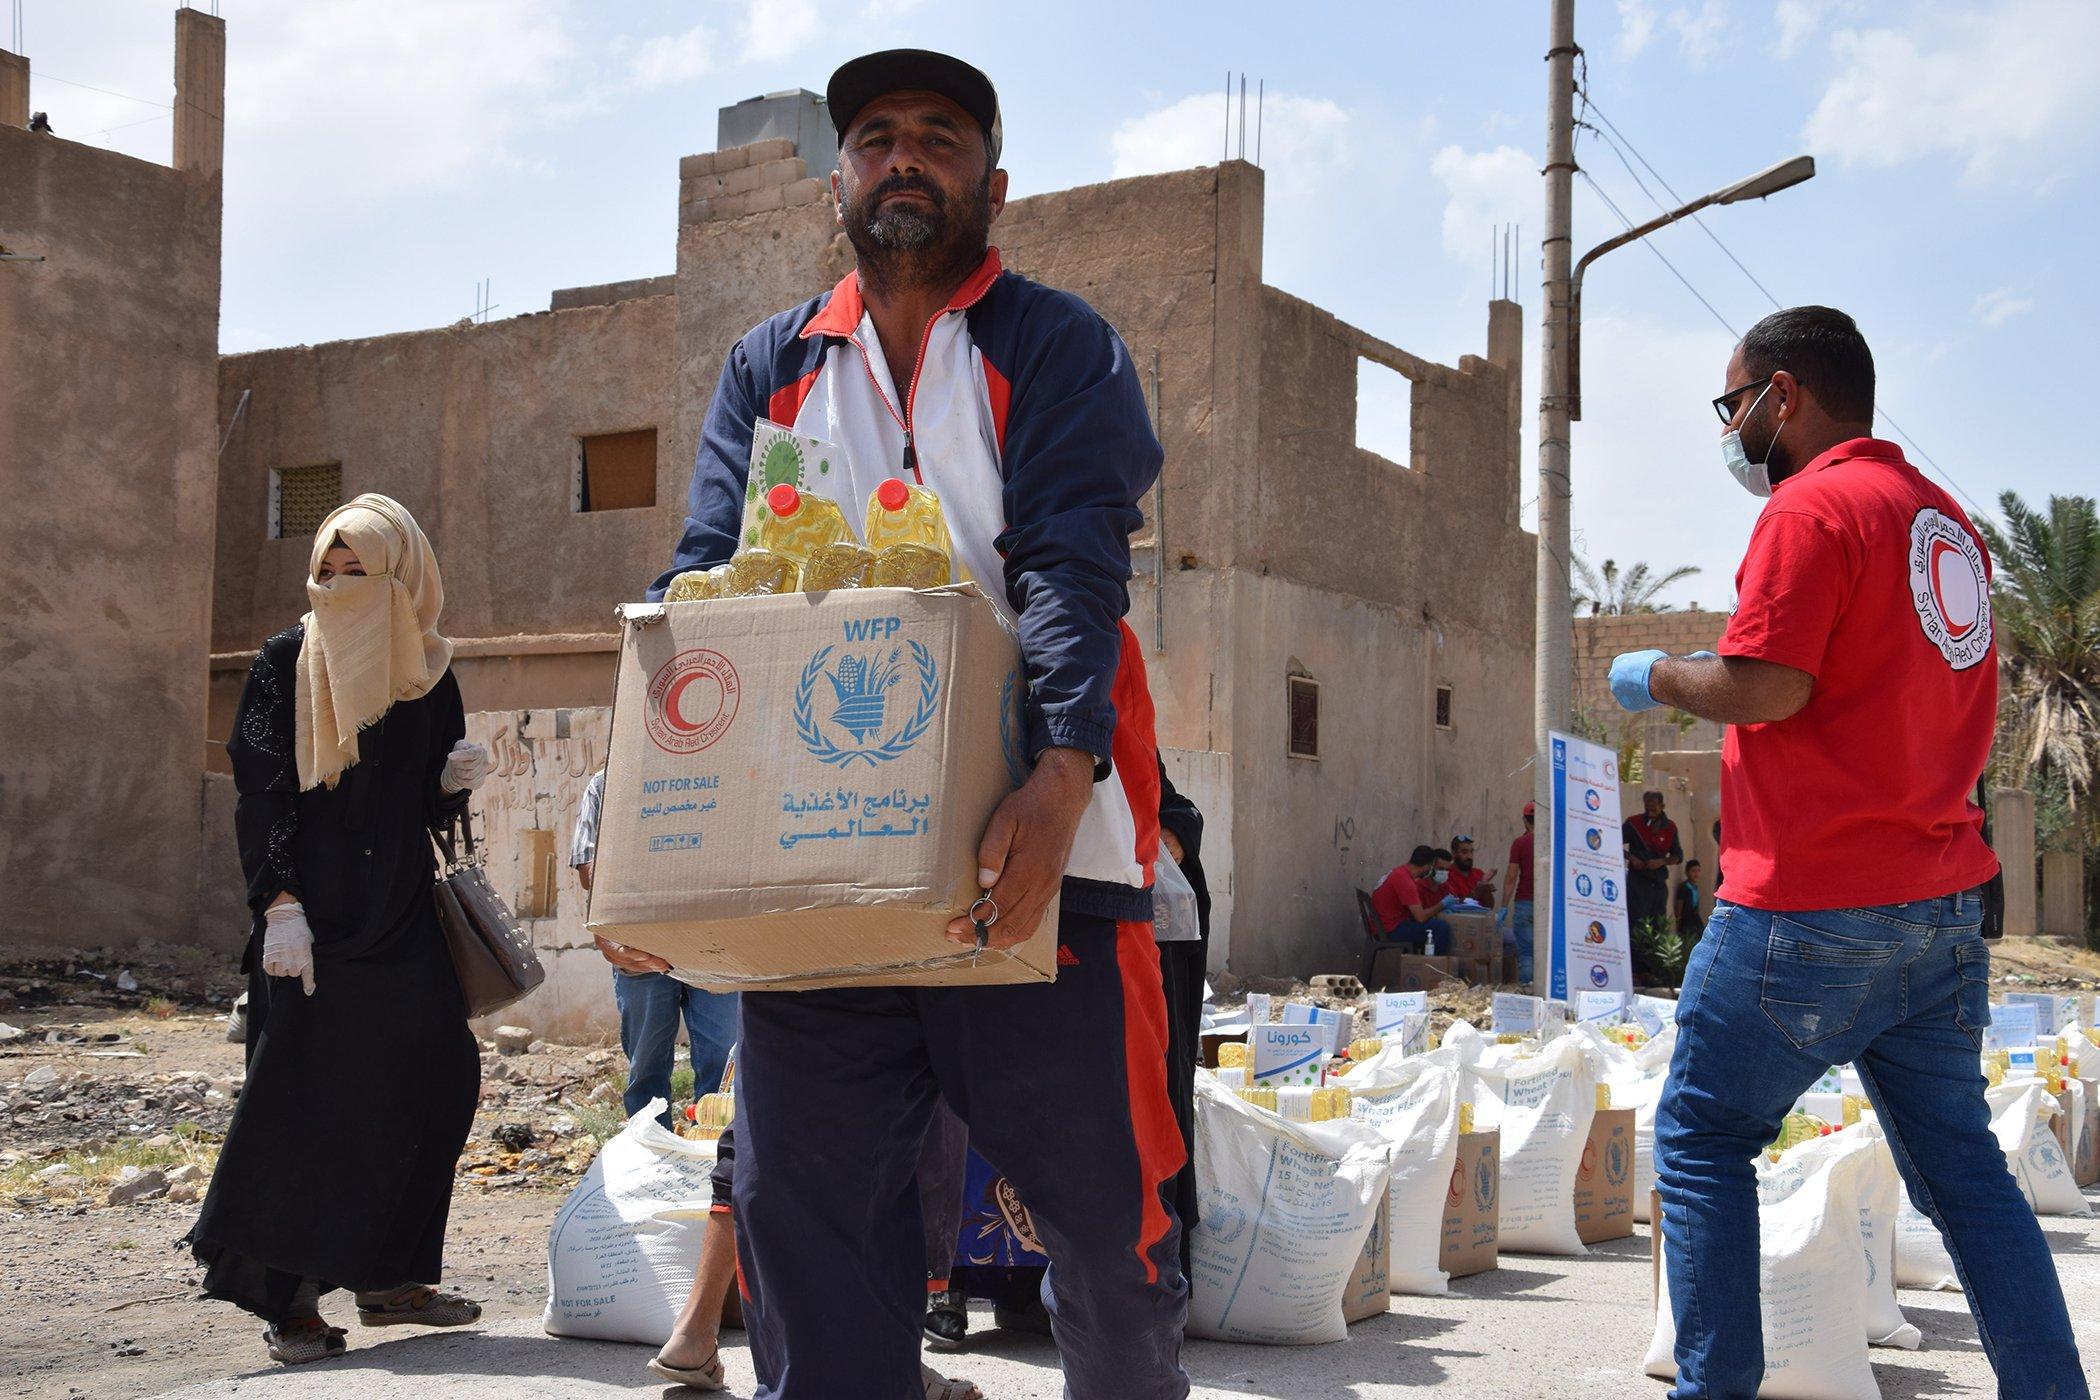 World-Food-Programme-Famine-Philanthropy-Billionares-COVID19-Response-002.JPG